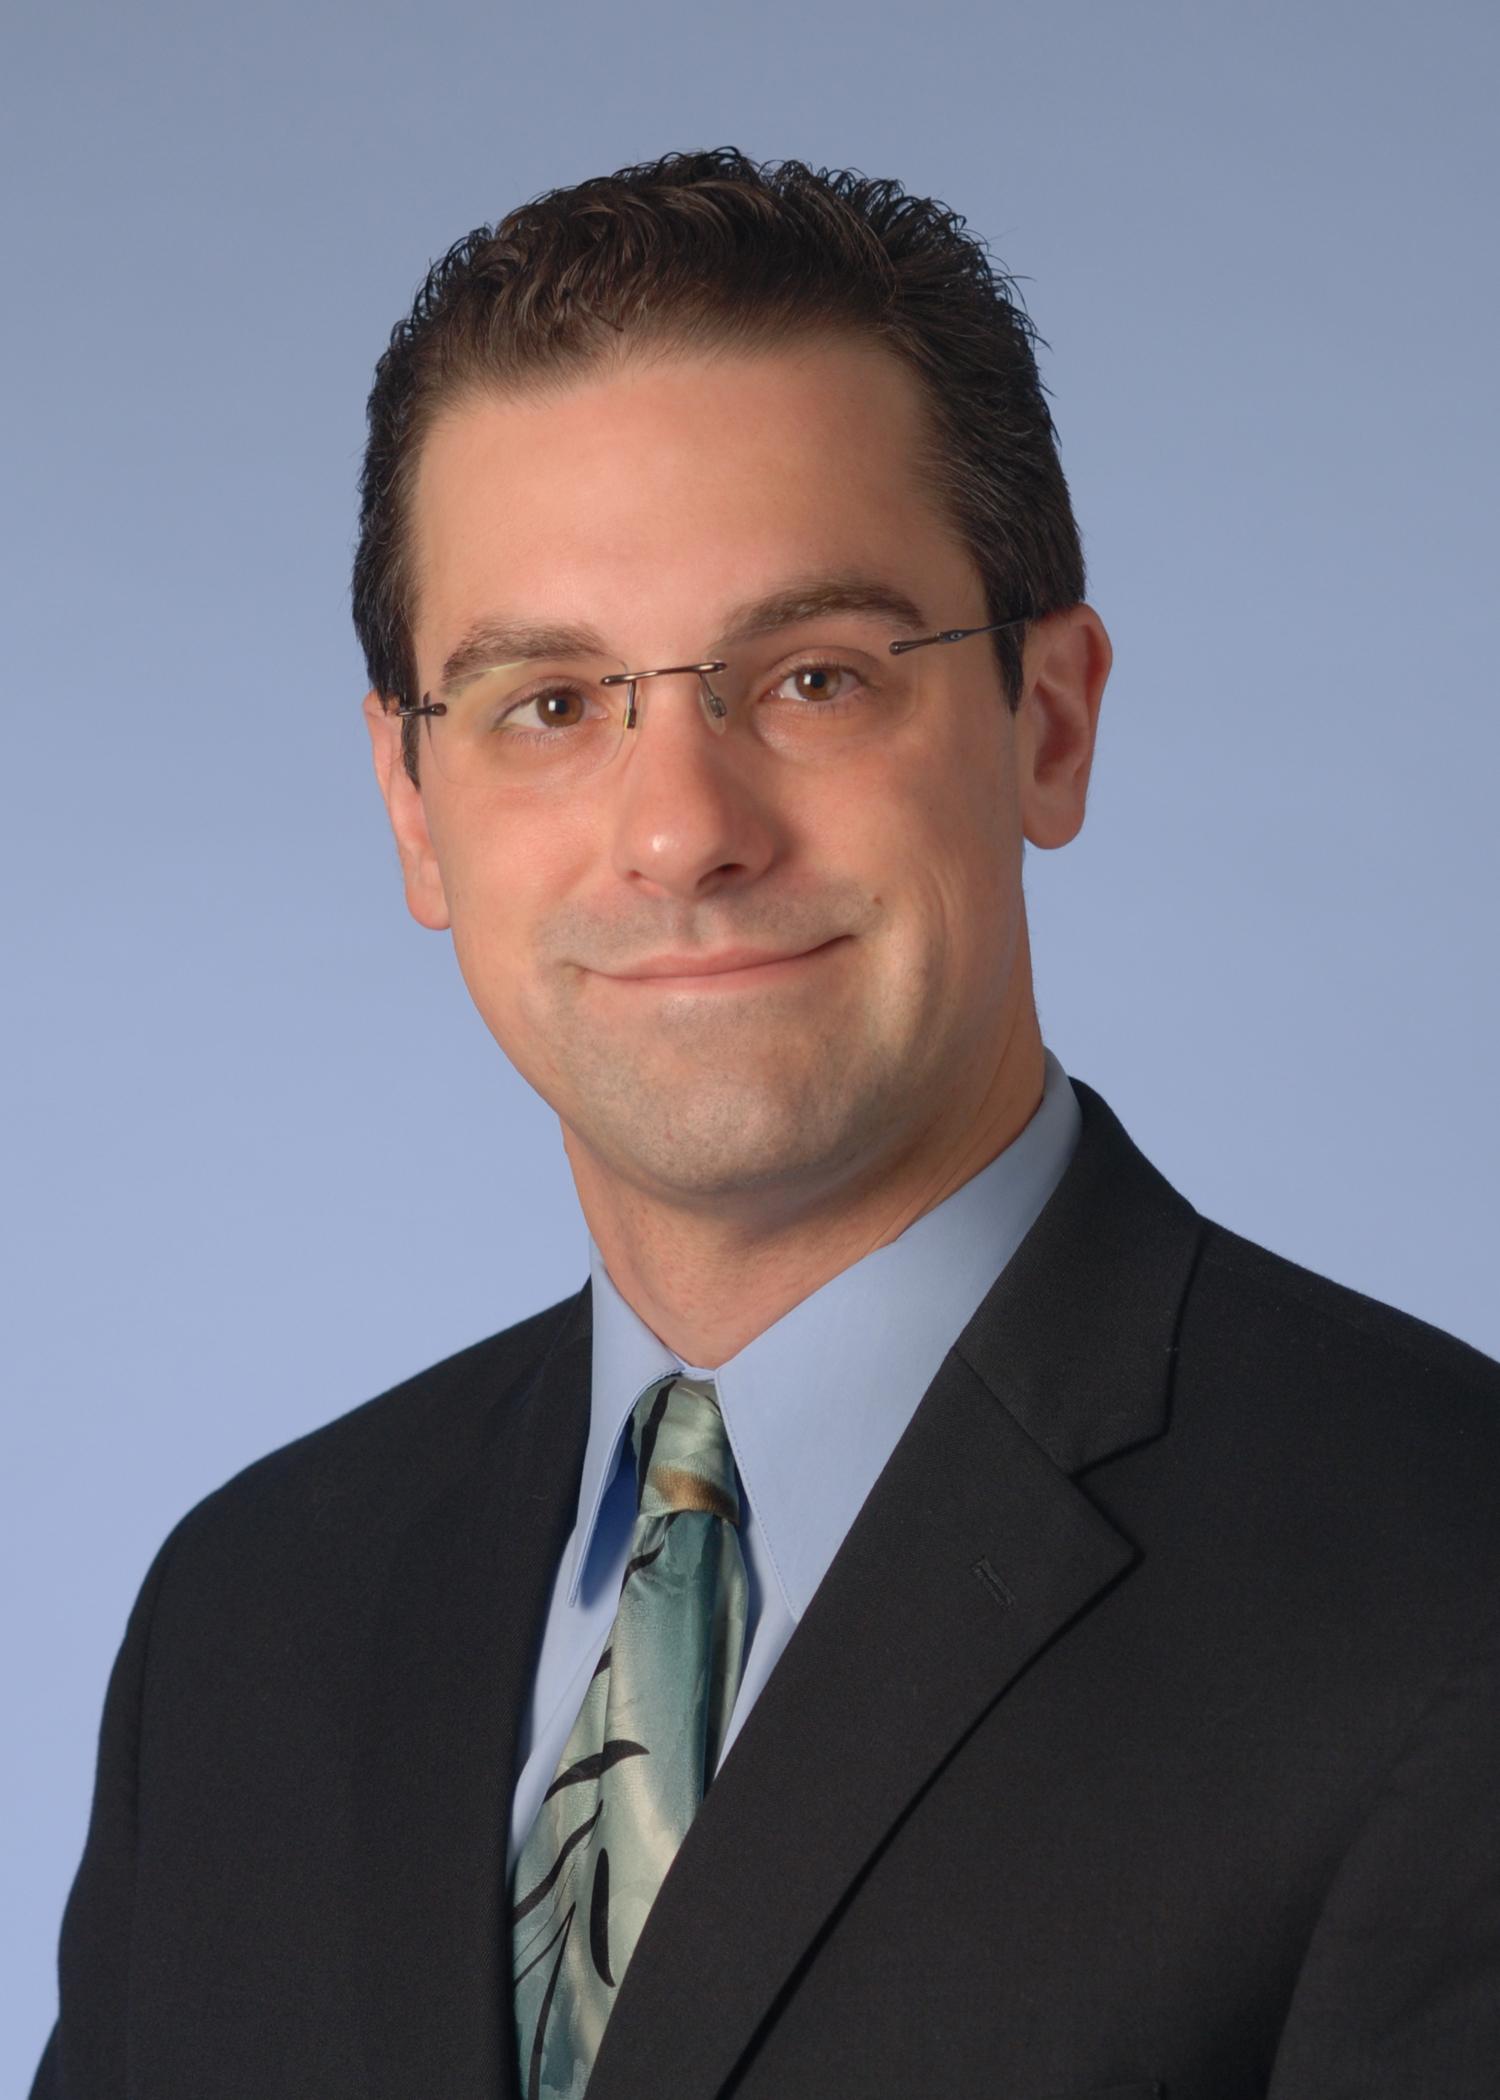 Martin H. Plawecki, M.D., Ph.D.